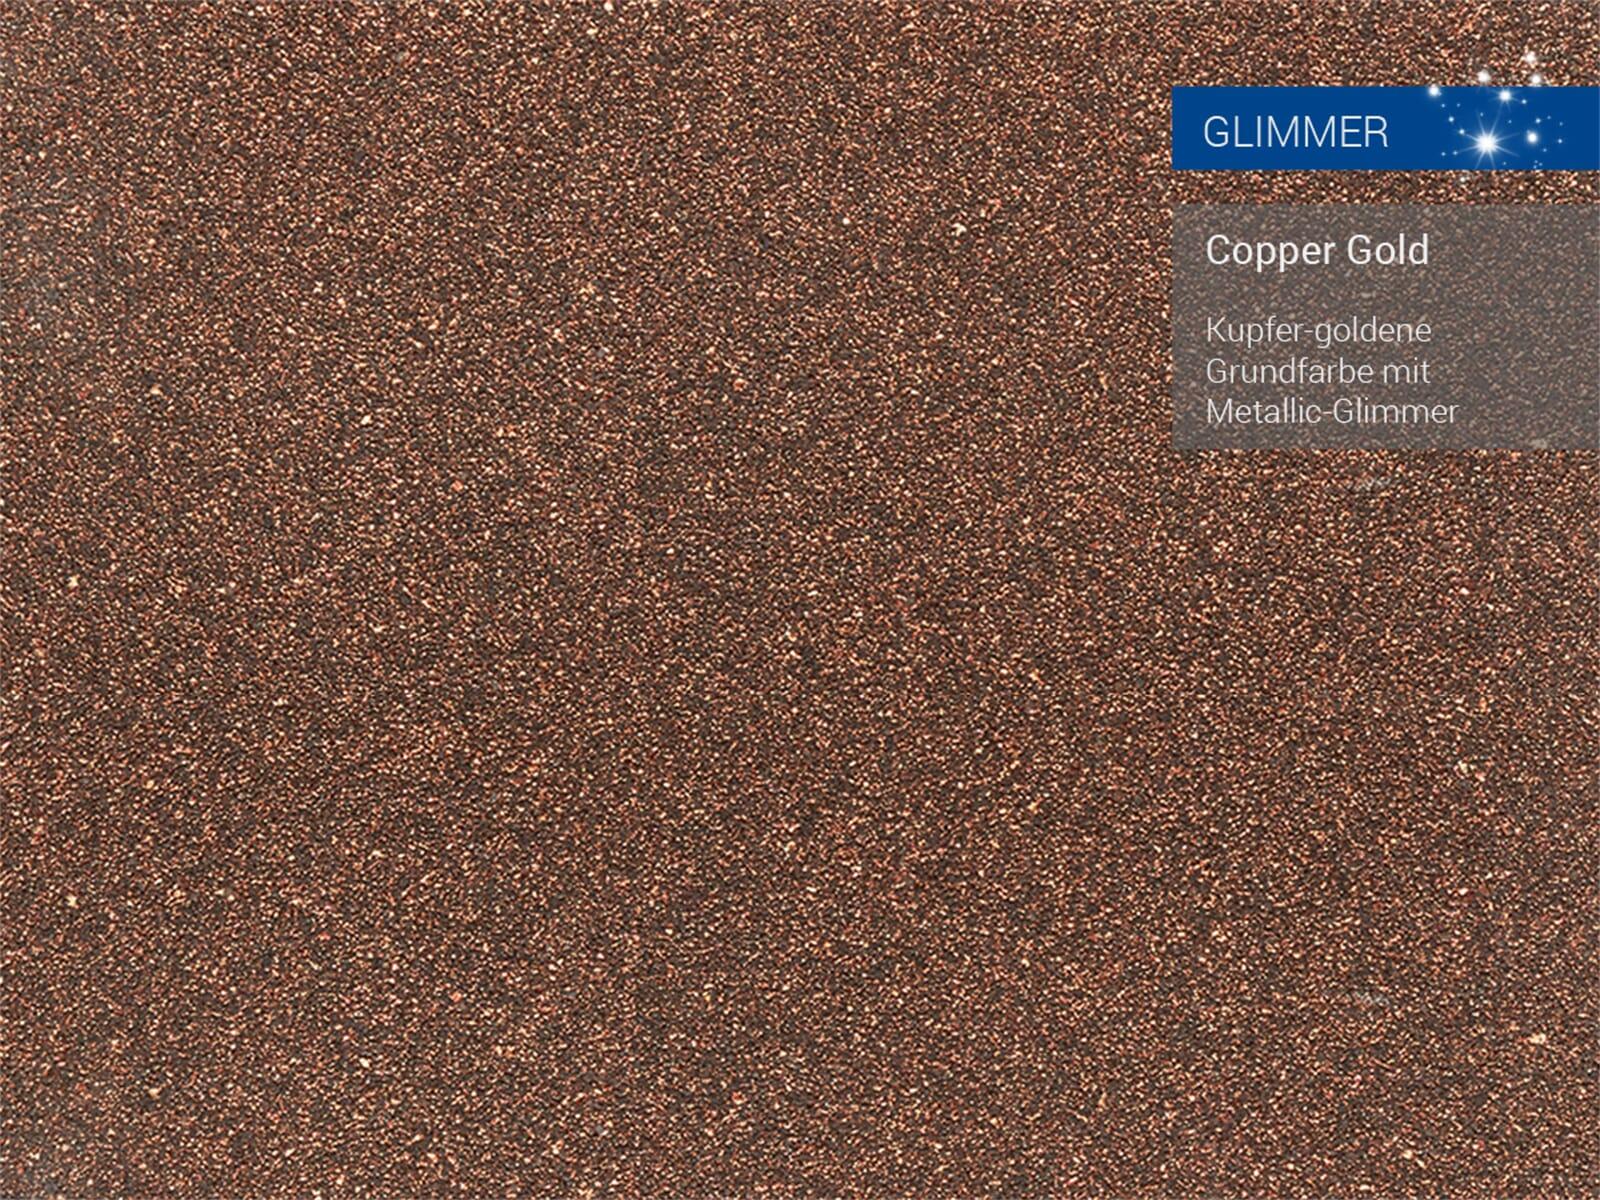 Franke Kubus 2 KNG 110-52 Copper Gold - 11963 Granitspüle Exzenterbetätigung